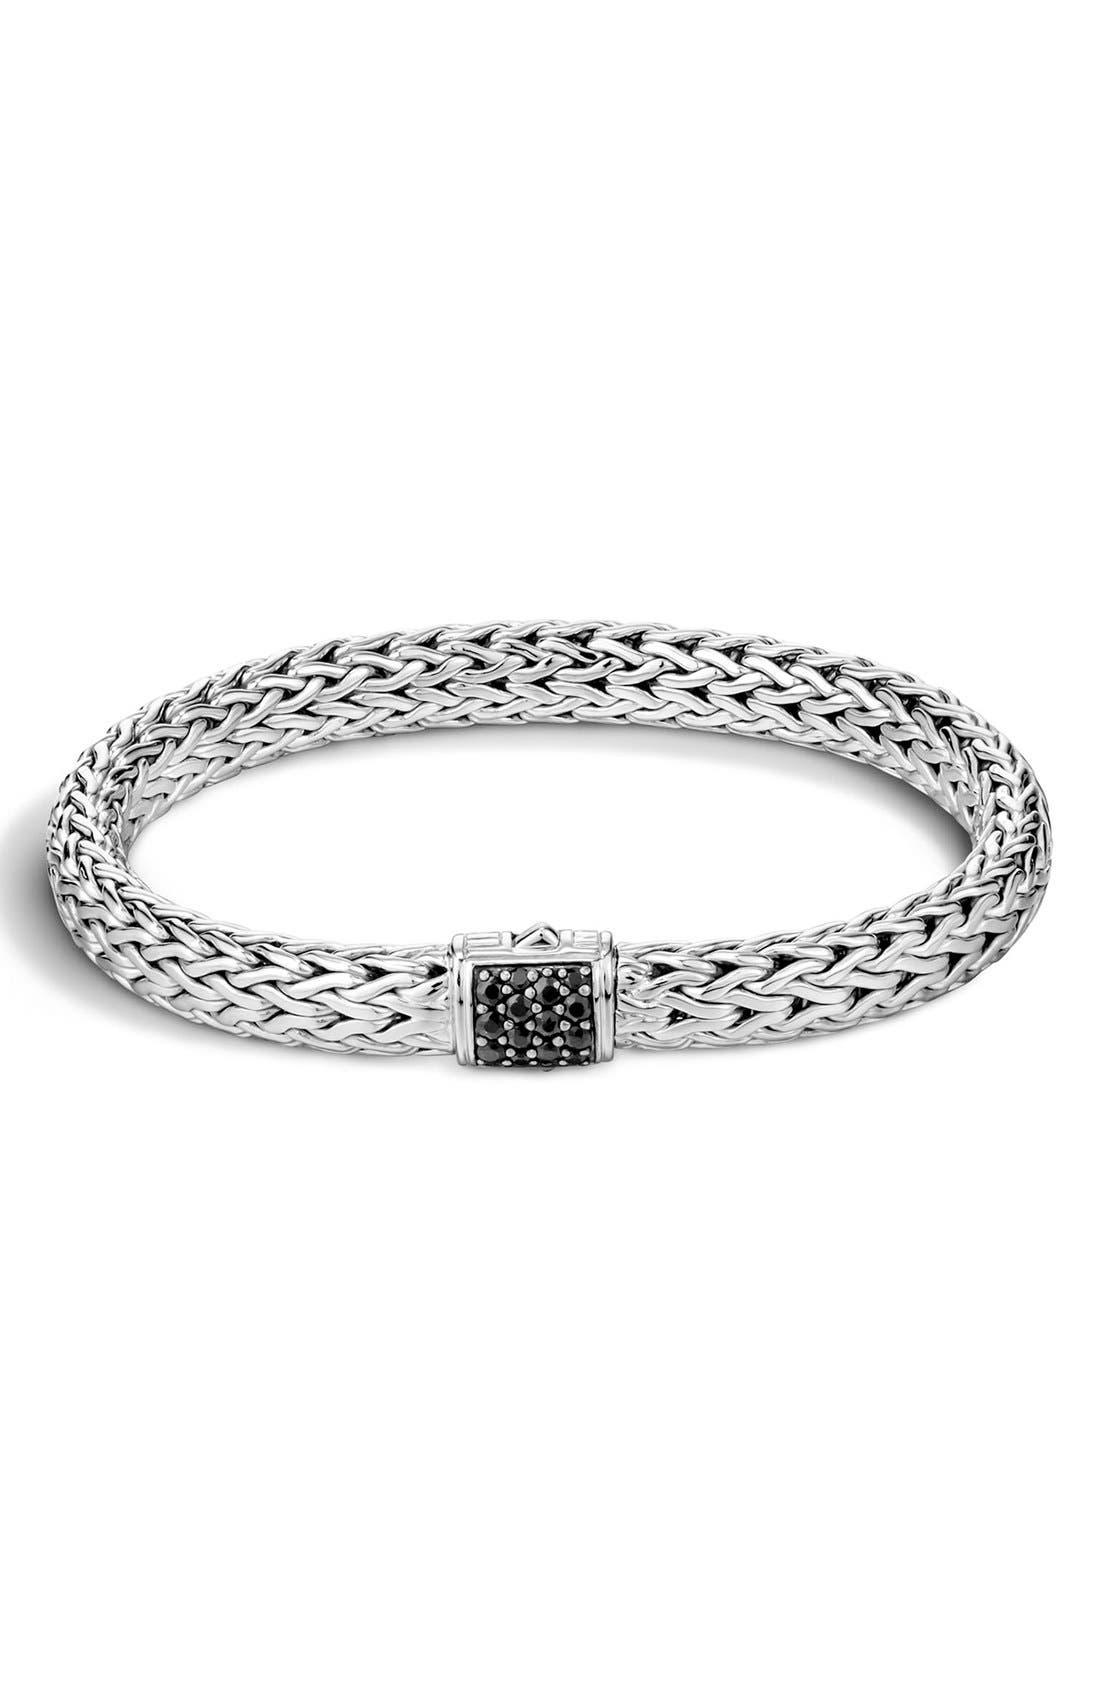 Alternate Image 1 Selected - John Hardy Classic Chain 7.5mm Bracelet